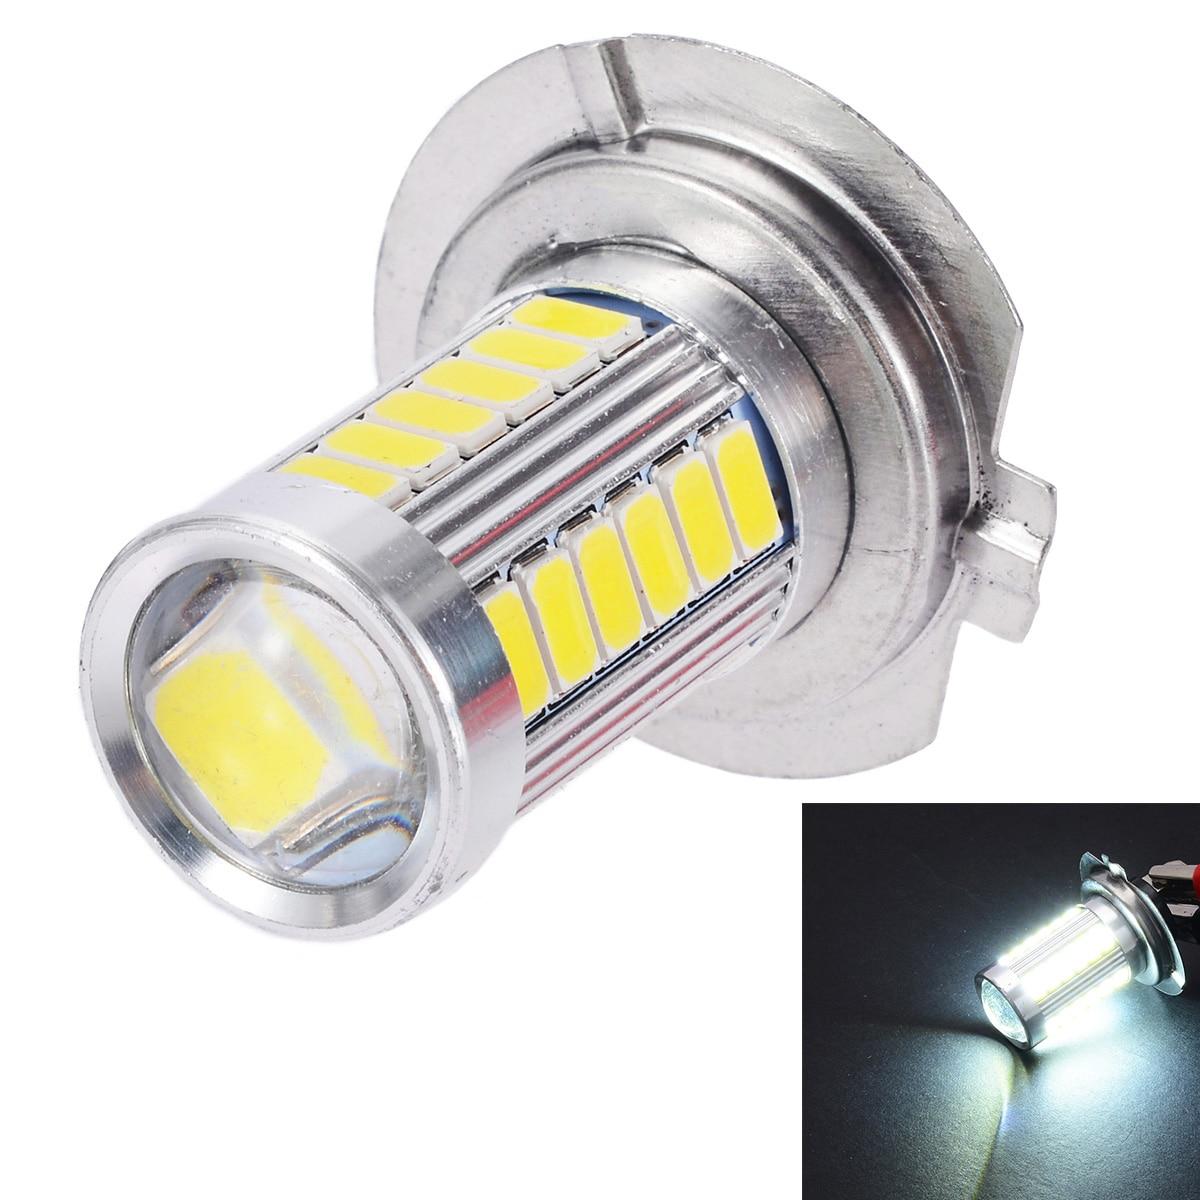 FITS MERCEDES SPRINTER 2007+SET OF 4X H7 5630 33SMD LED FOG LIGHT BEAM CAR BULBS